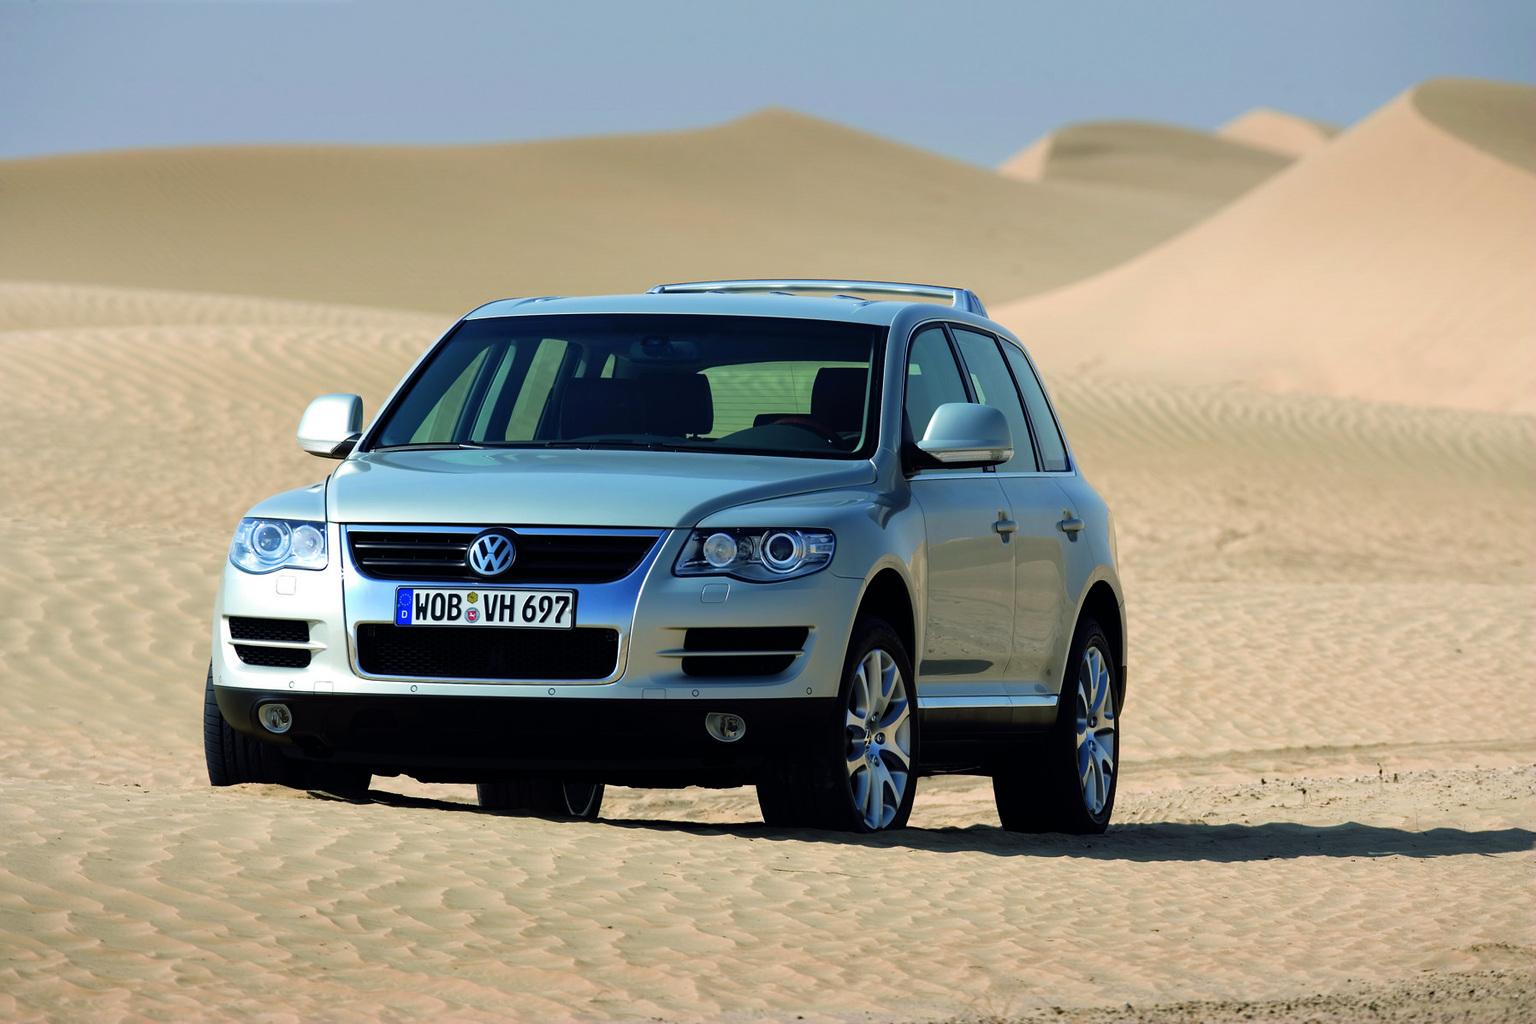 Volkswagen Touareg Auto Wallpapers GroenLicht.be